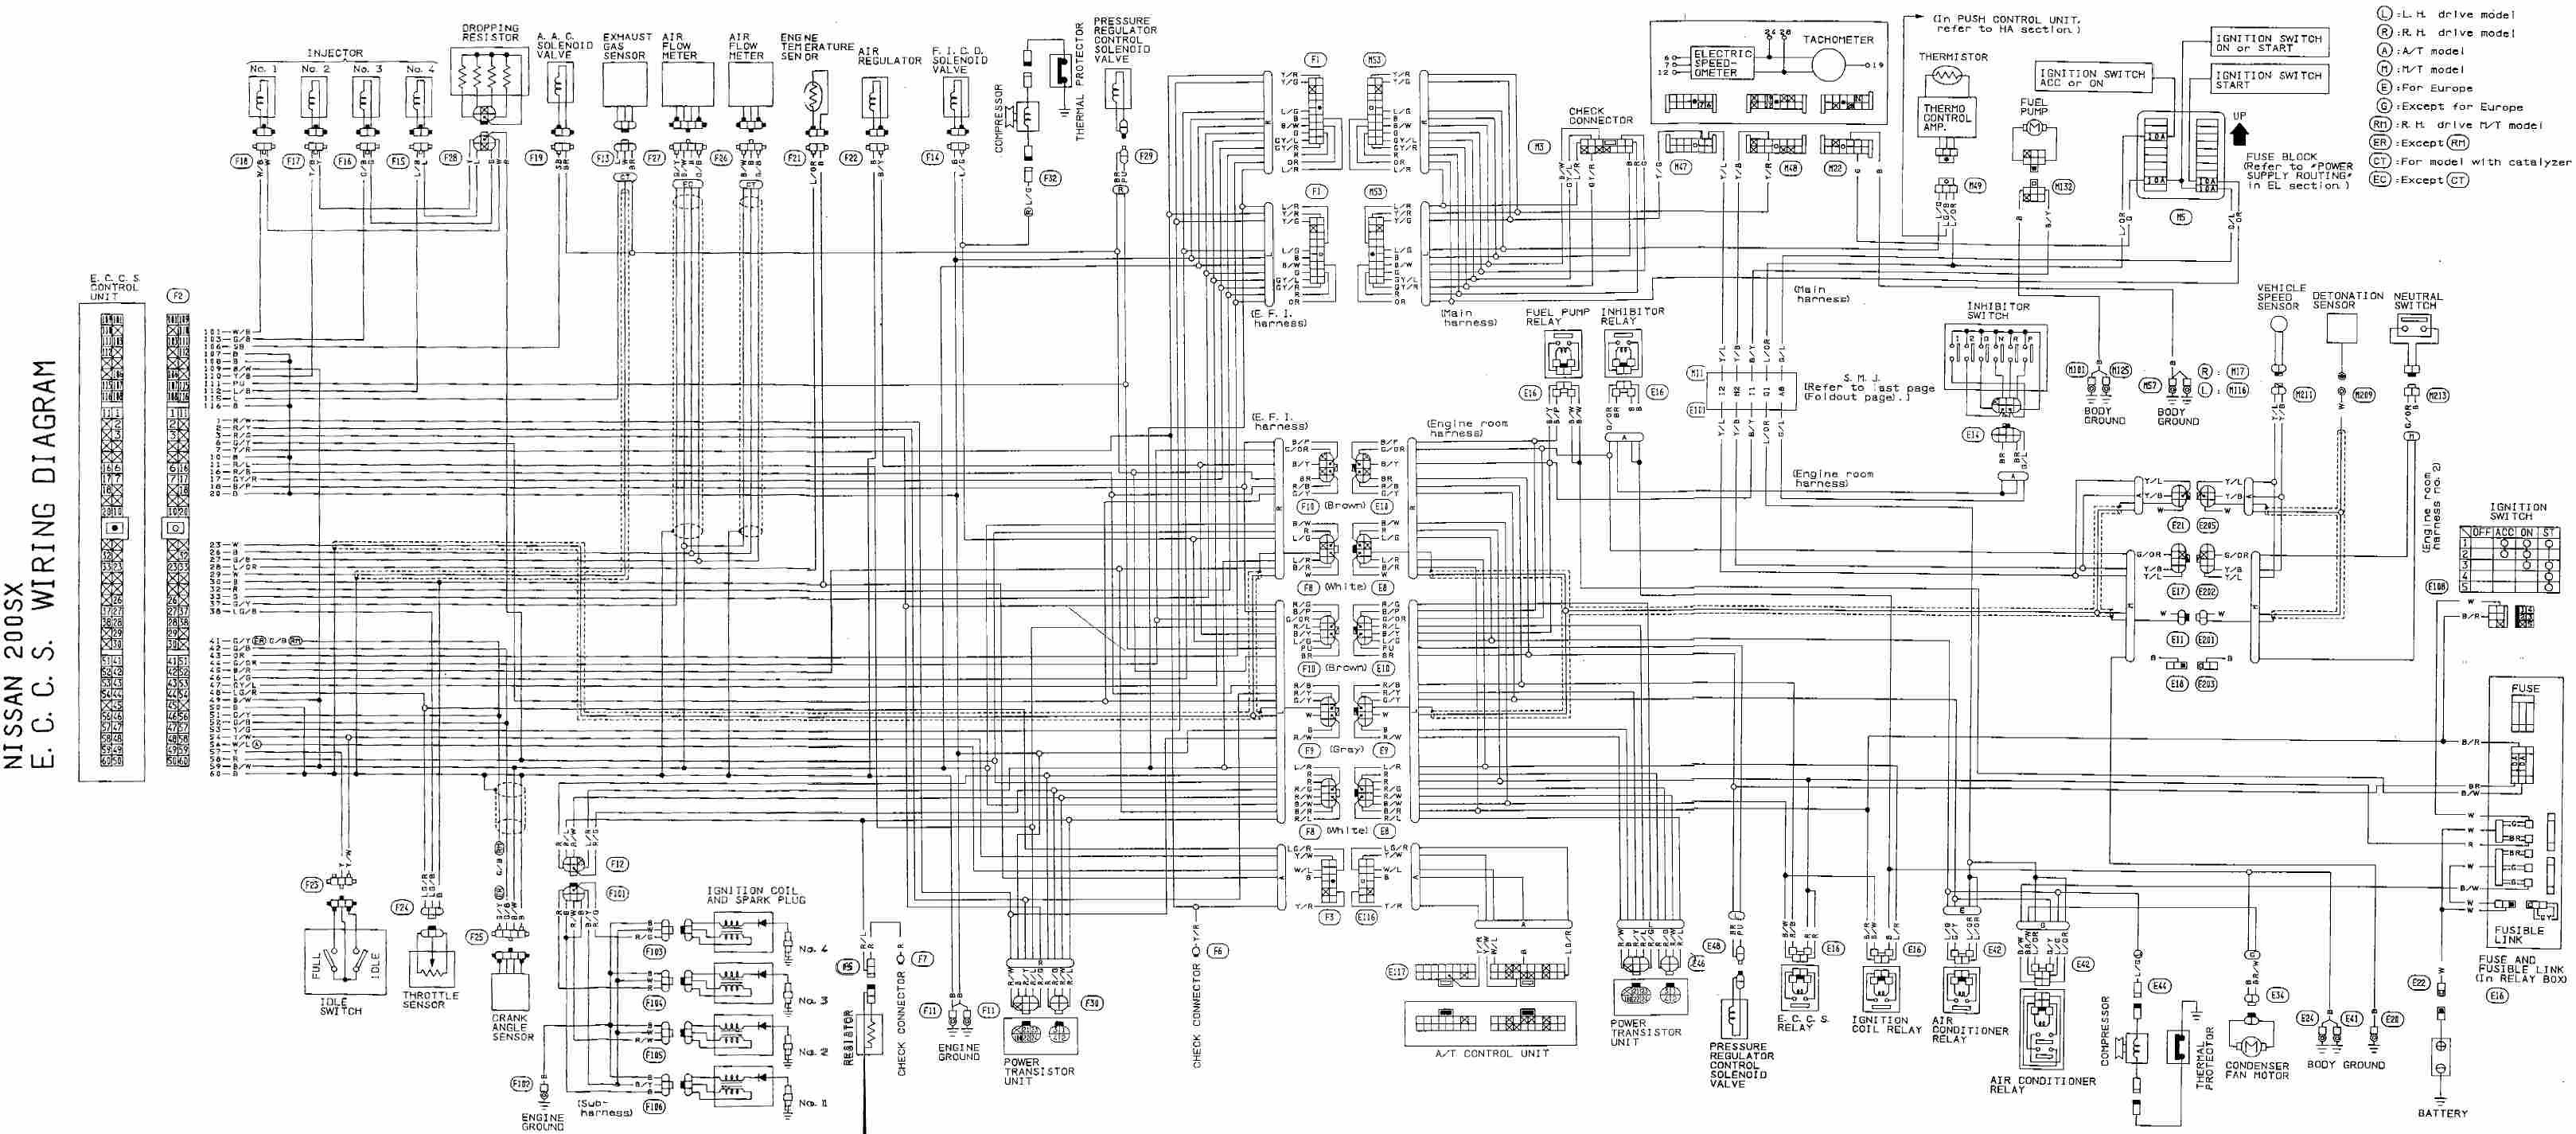 2000 nissan sentra engine diagram wiring diagram moreover